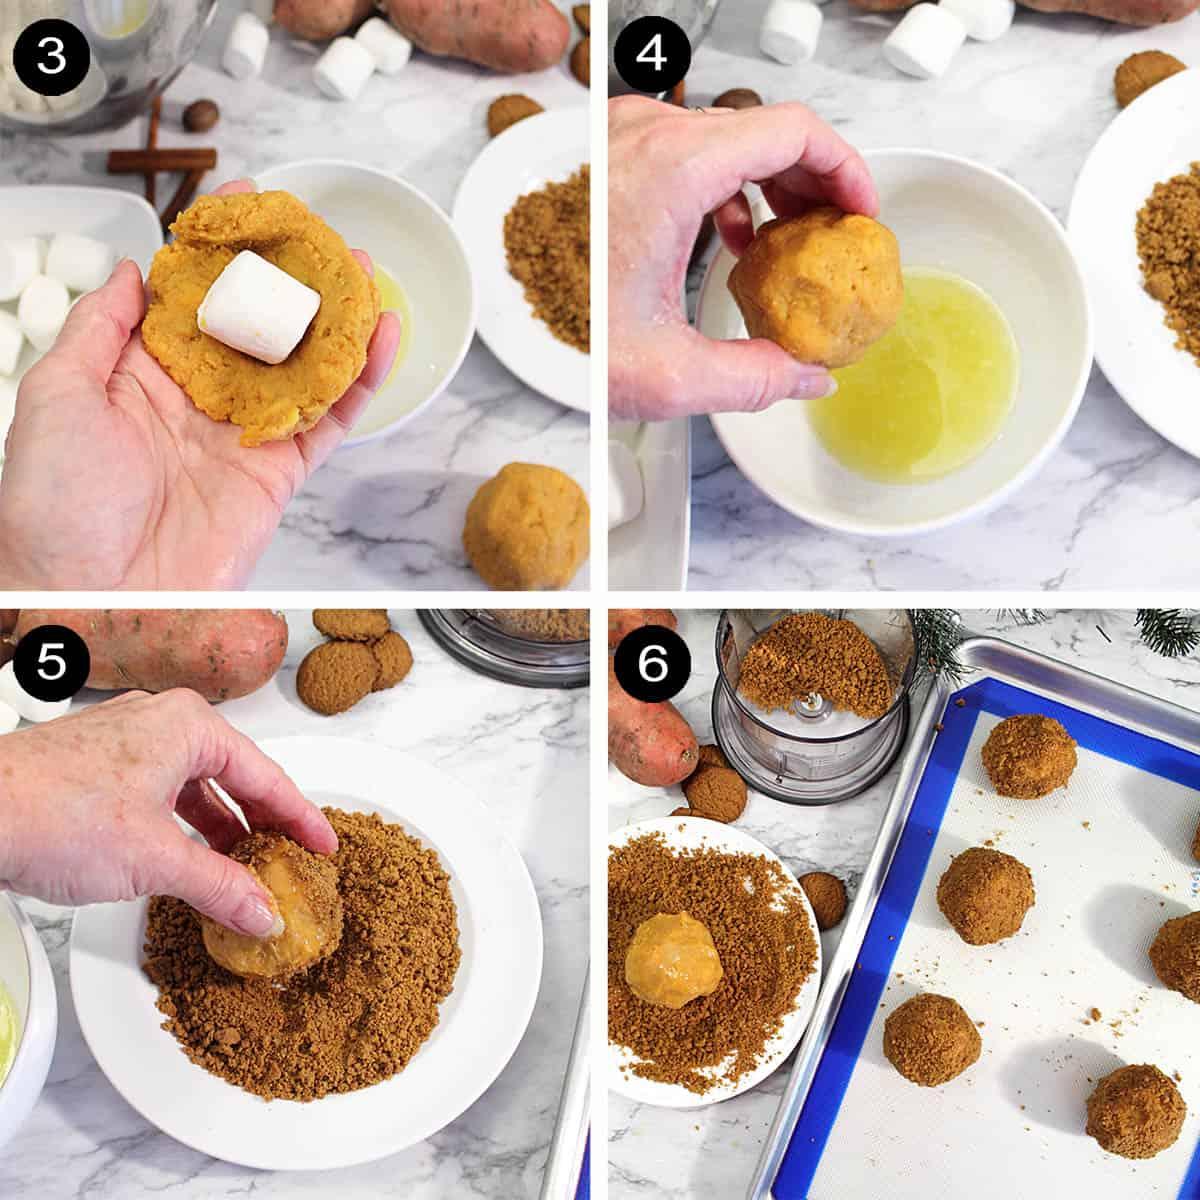 Sweet Potato Puffs assembly steps 3-6.